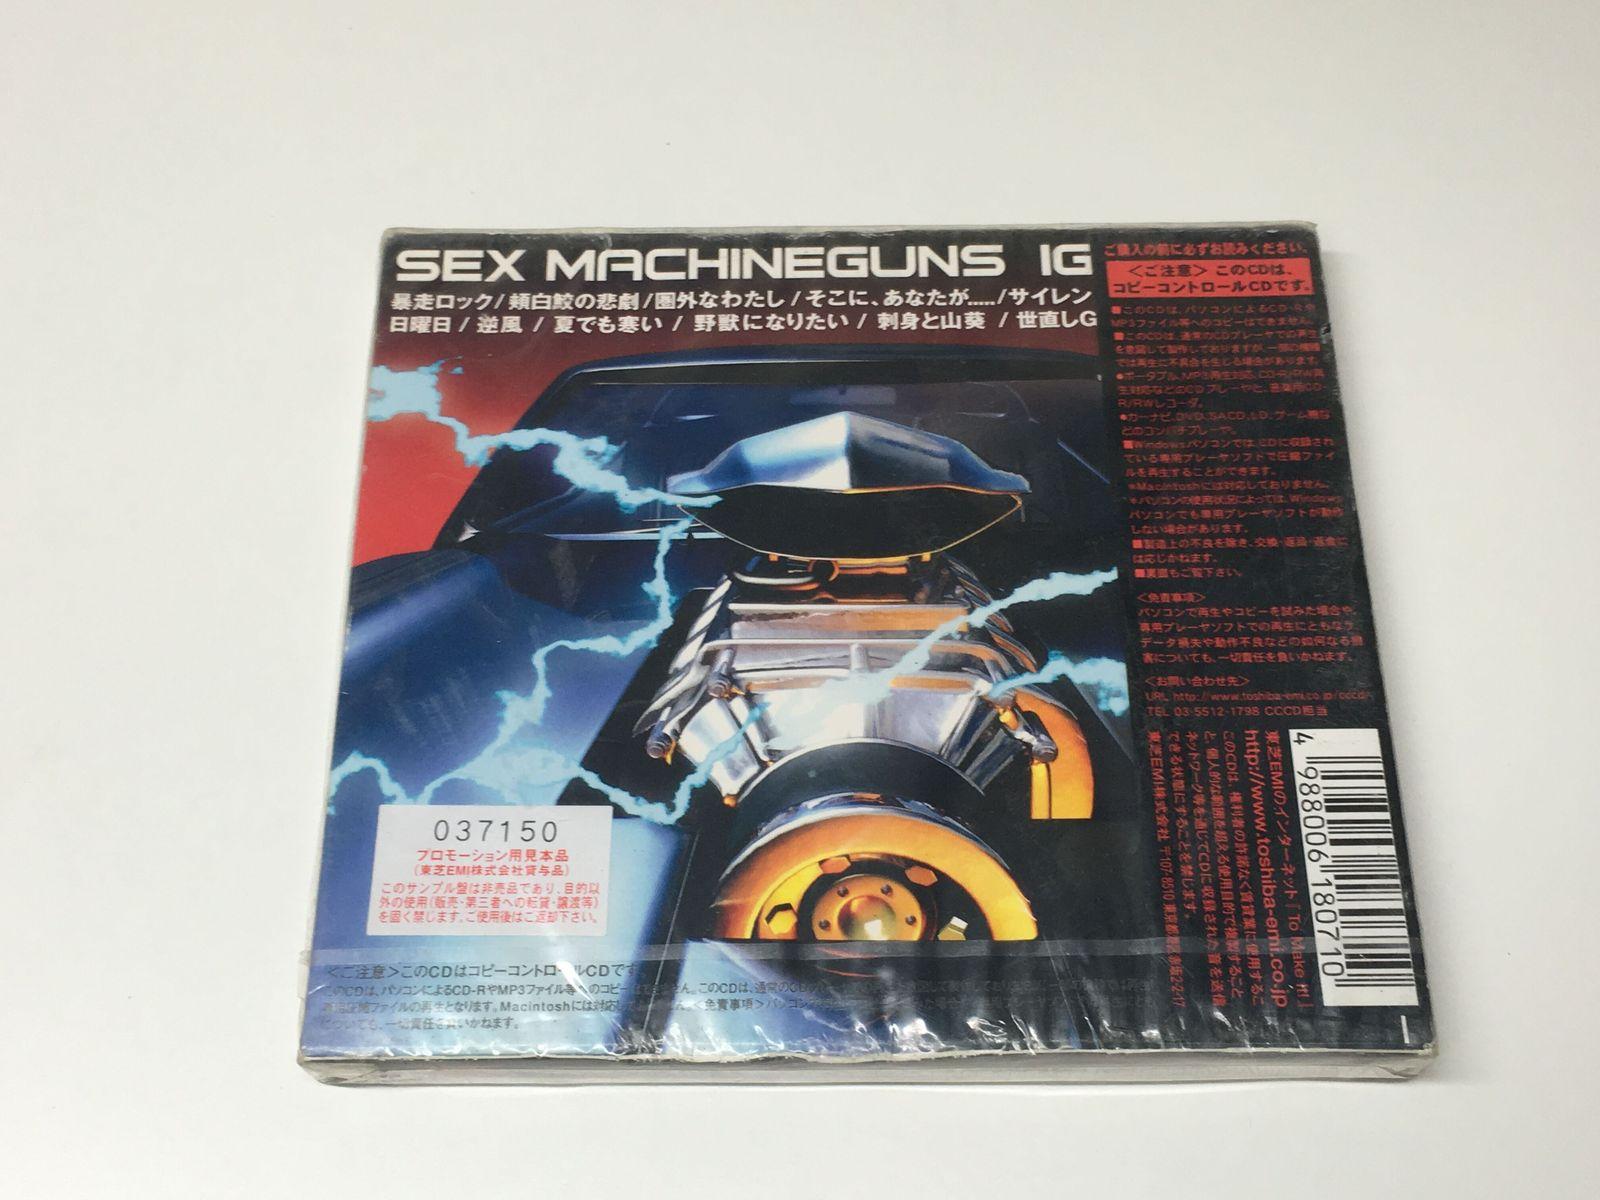 SEX MACHINEGUNS JAPAN LIMITED EDITION ALBUM CD IGNITION